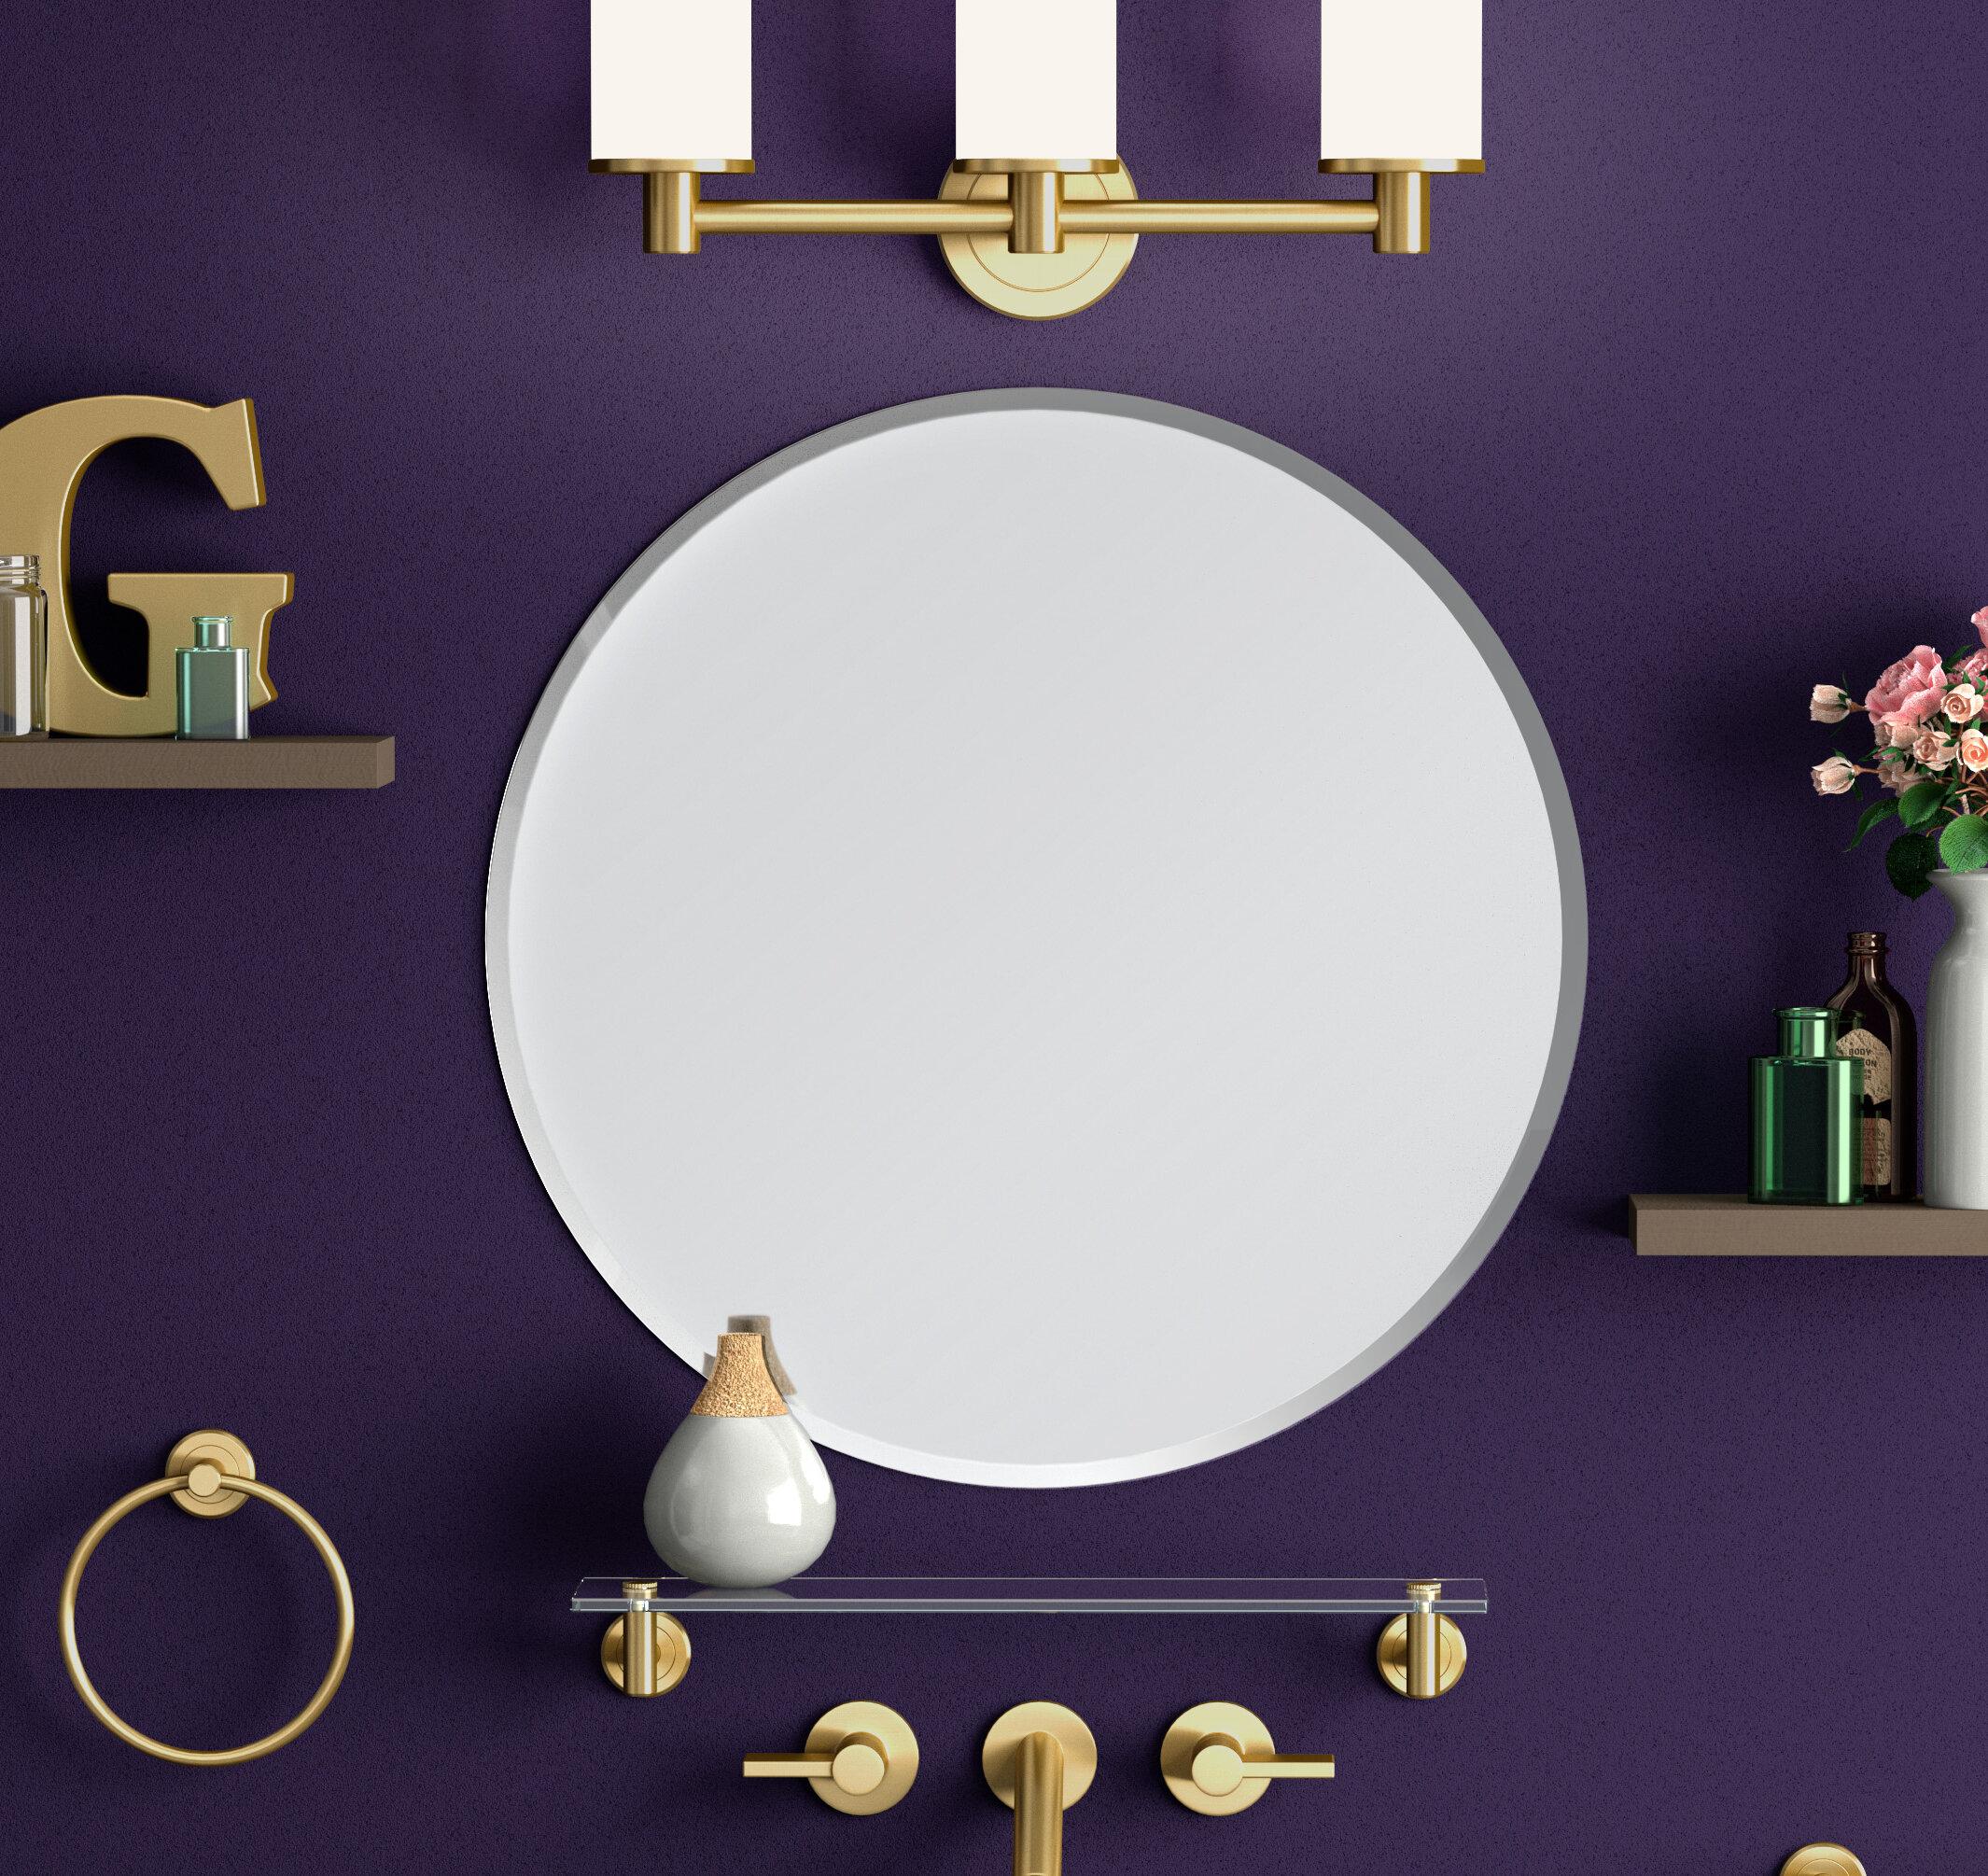 Gatco Flush Mount Modern Contemporary Beveled Frameless Bathroom Vanity Mirror Reviews Wayfair